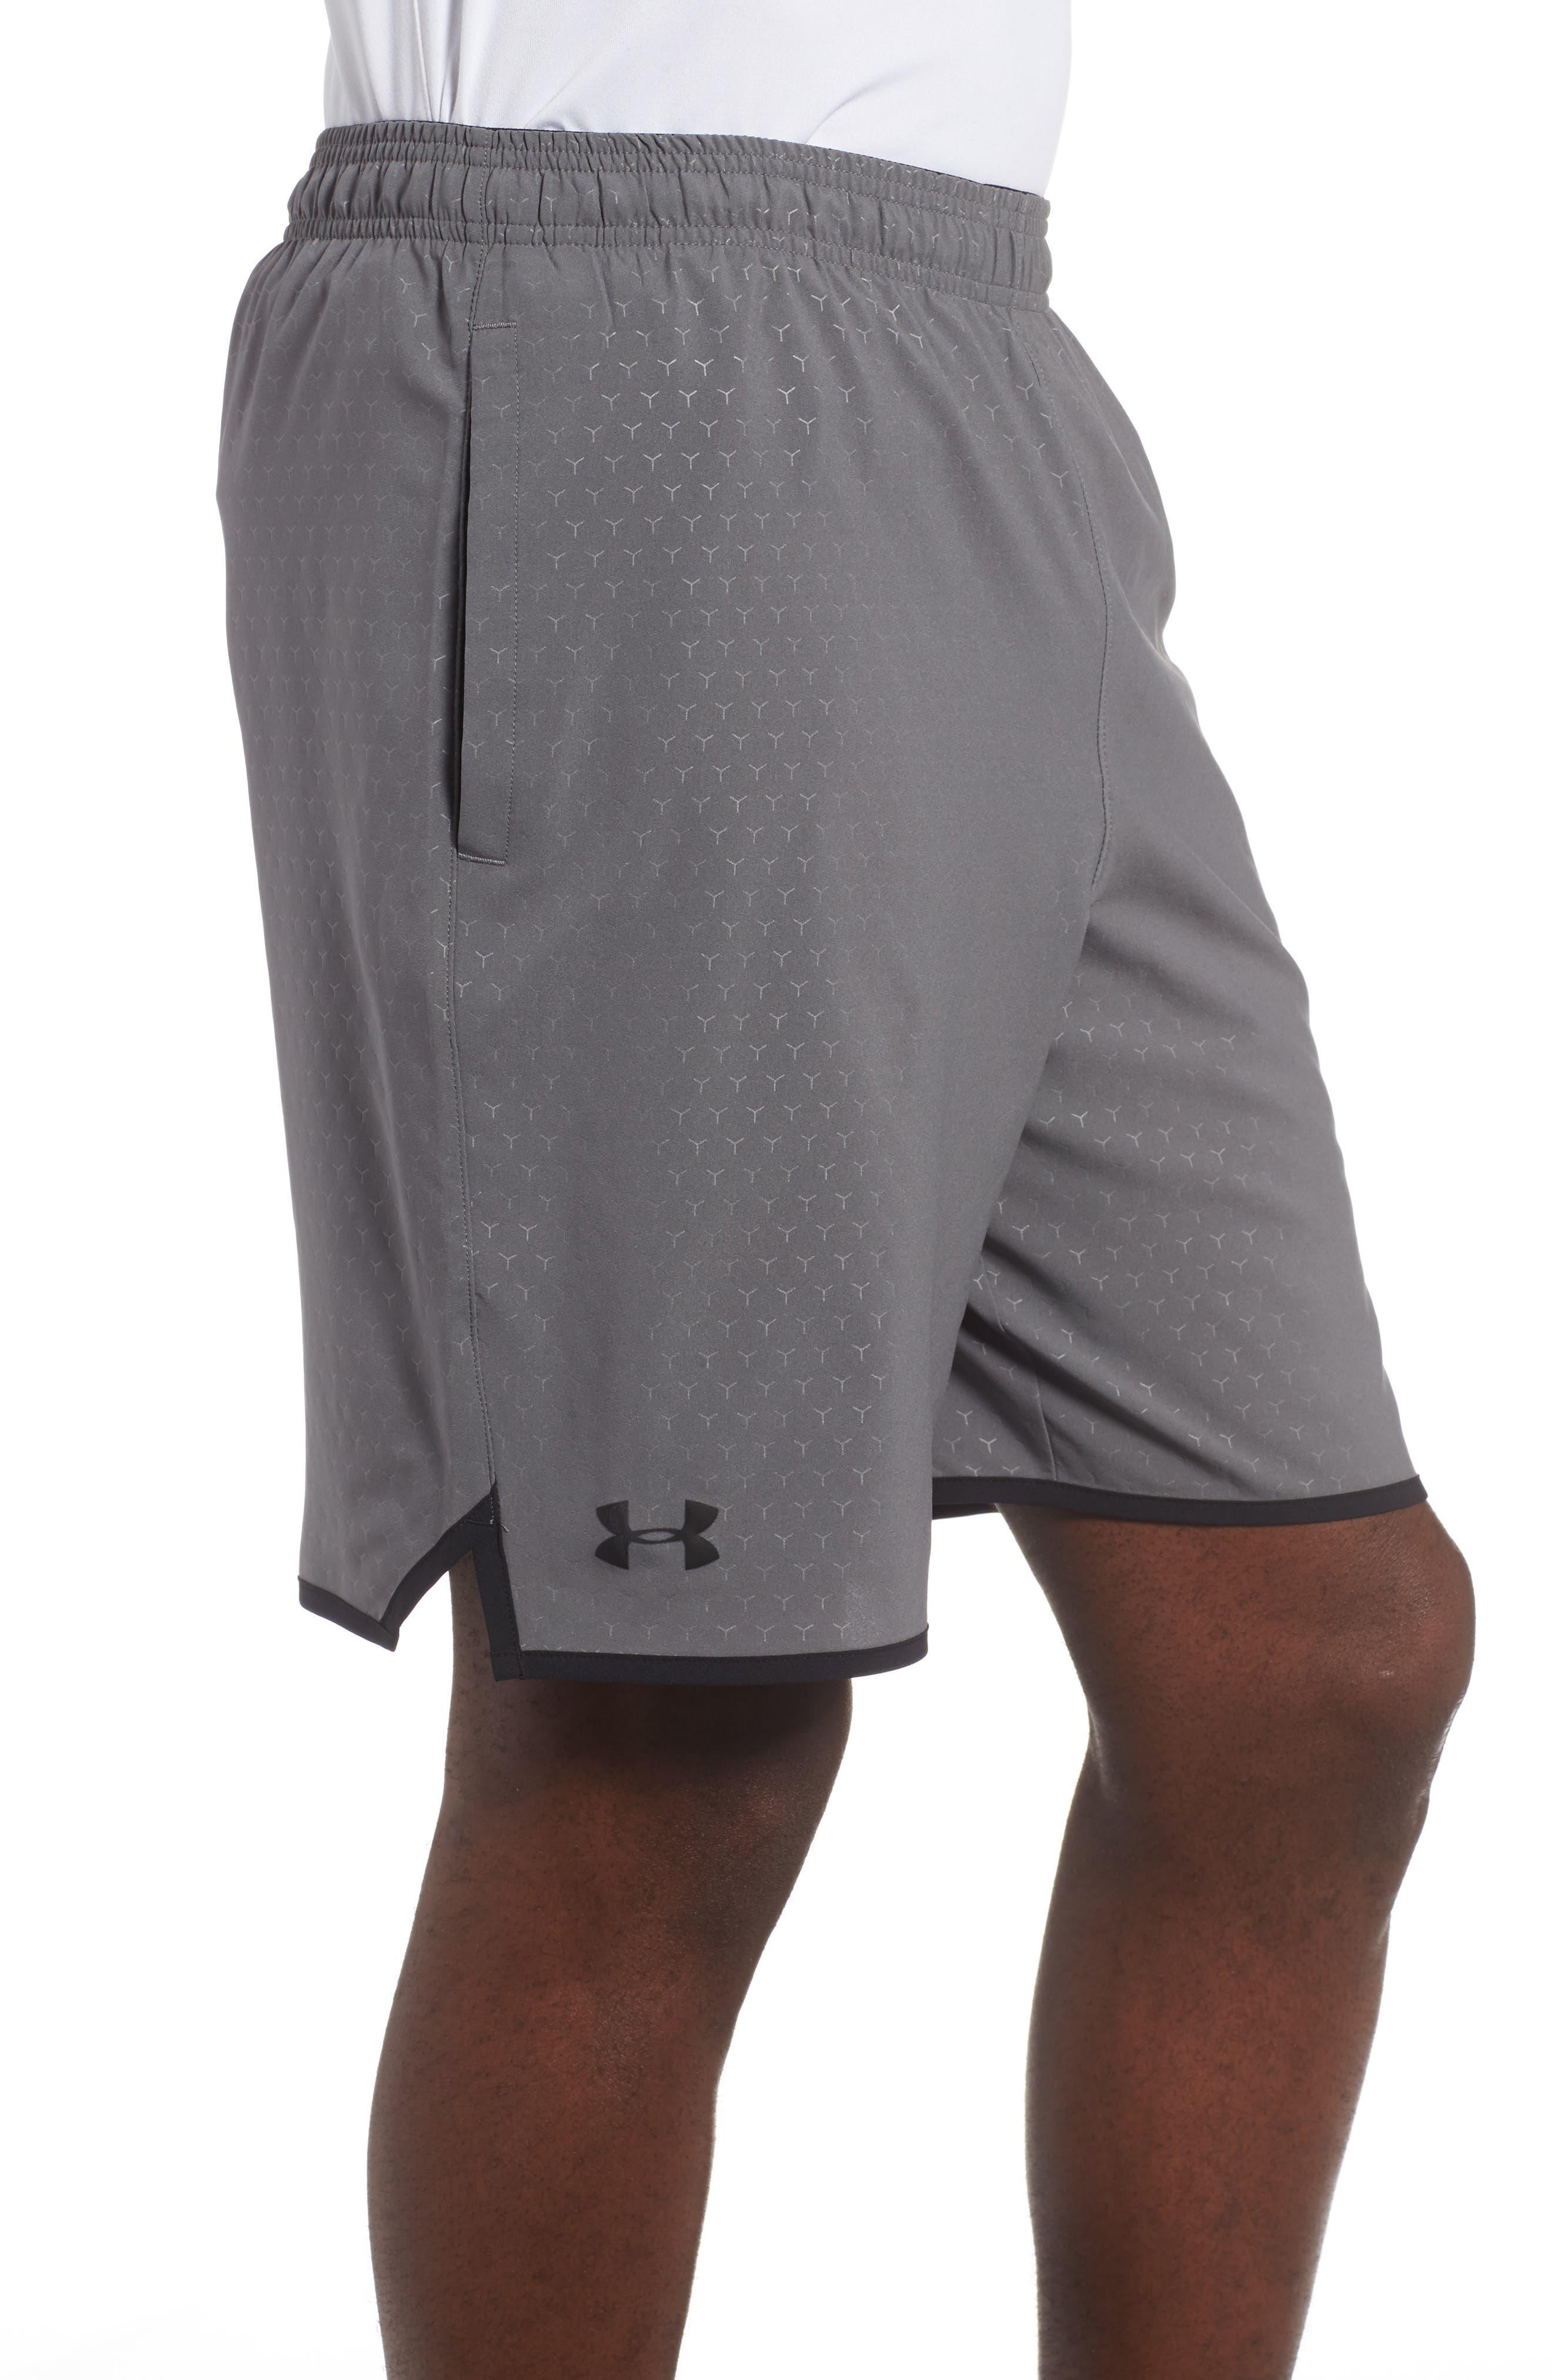 Alternate Image 3  - Under Armour Qualifier Training Shorts